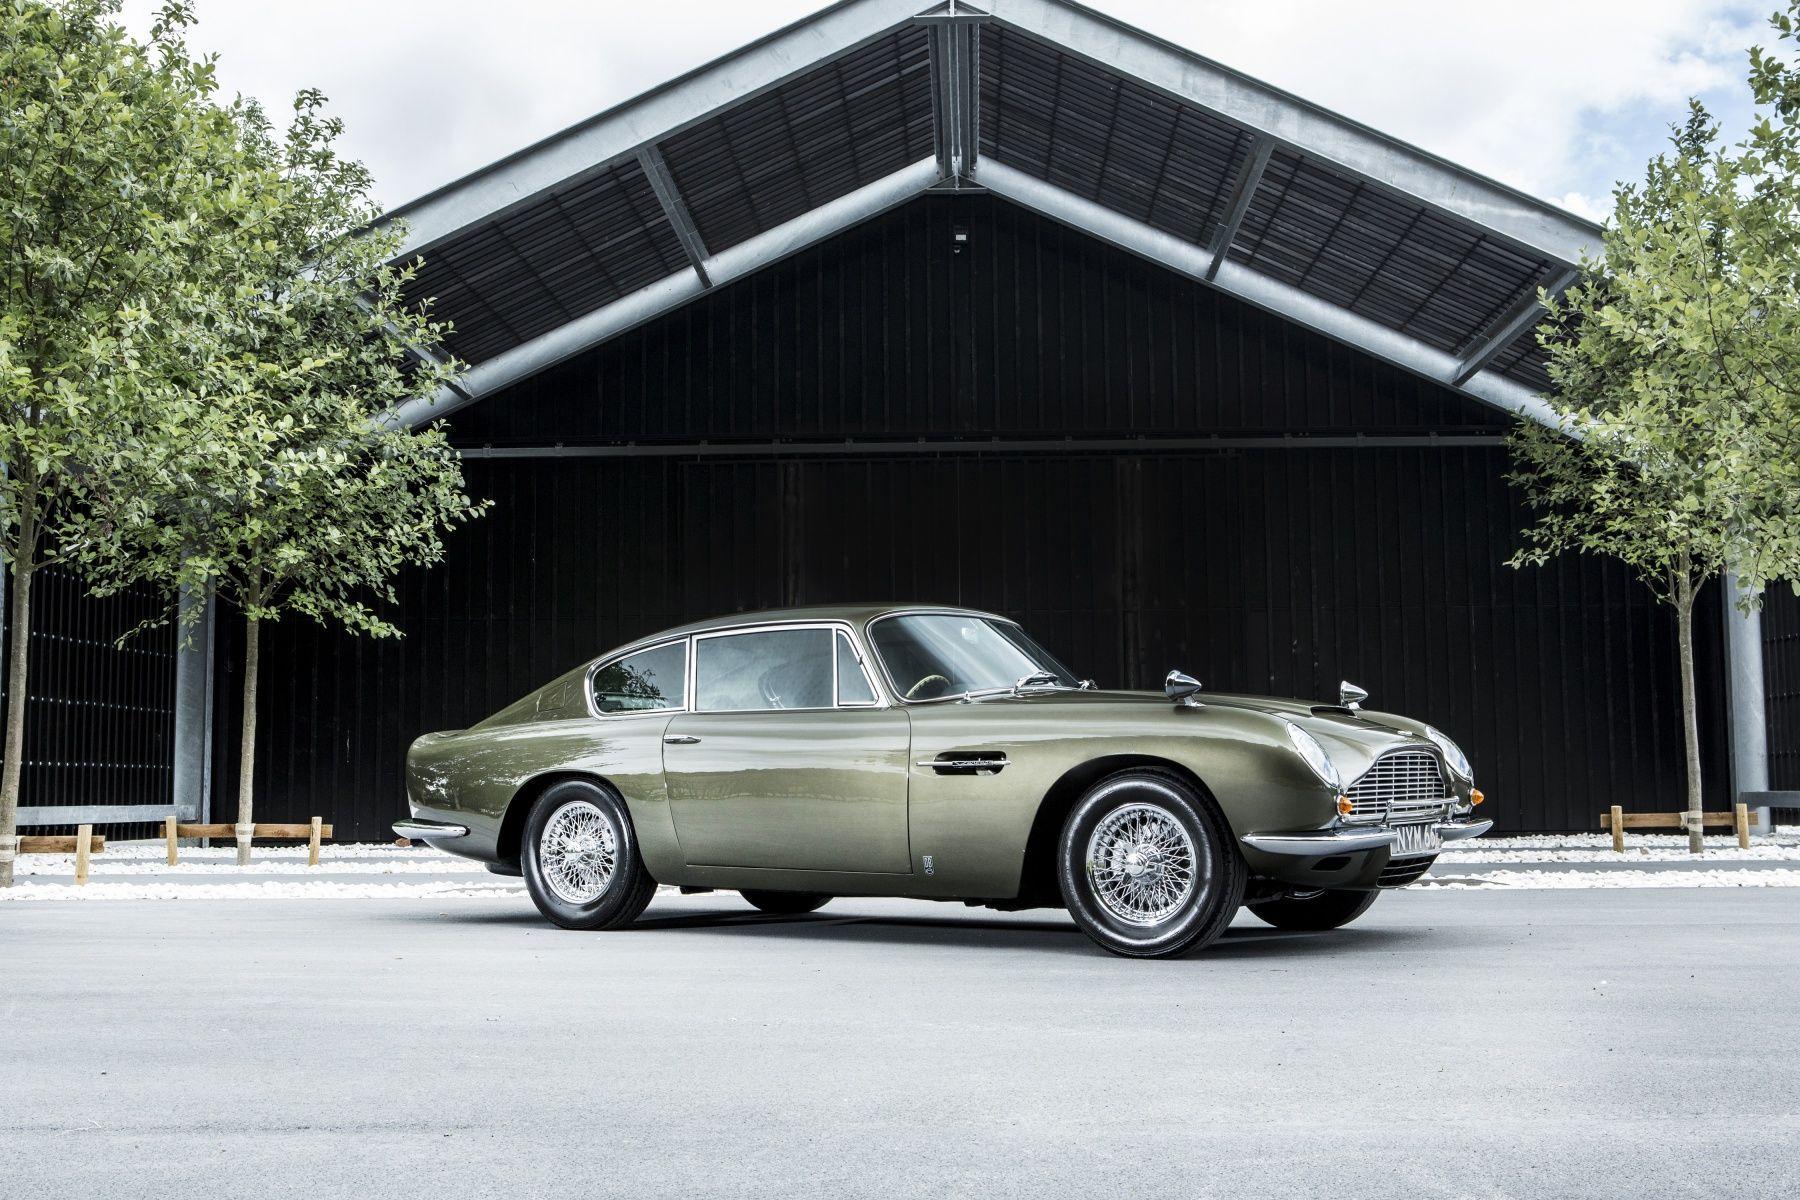 Aston Martin DB VANTAGE Classic Driver Market Aston - 1967 aston martin